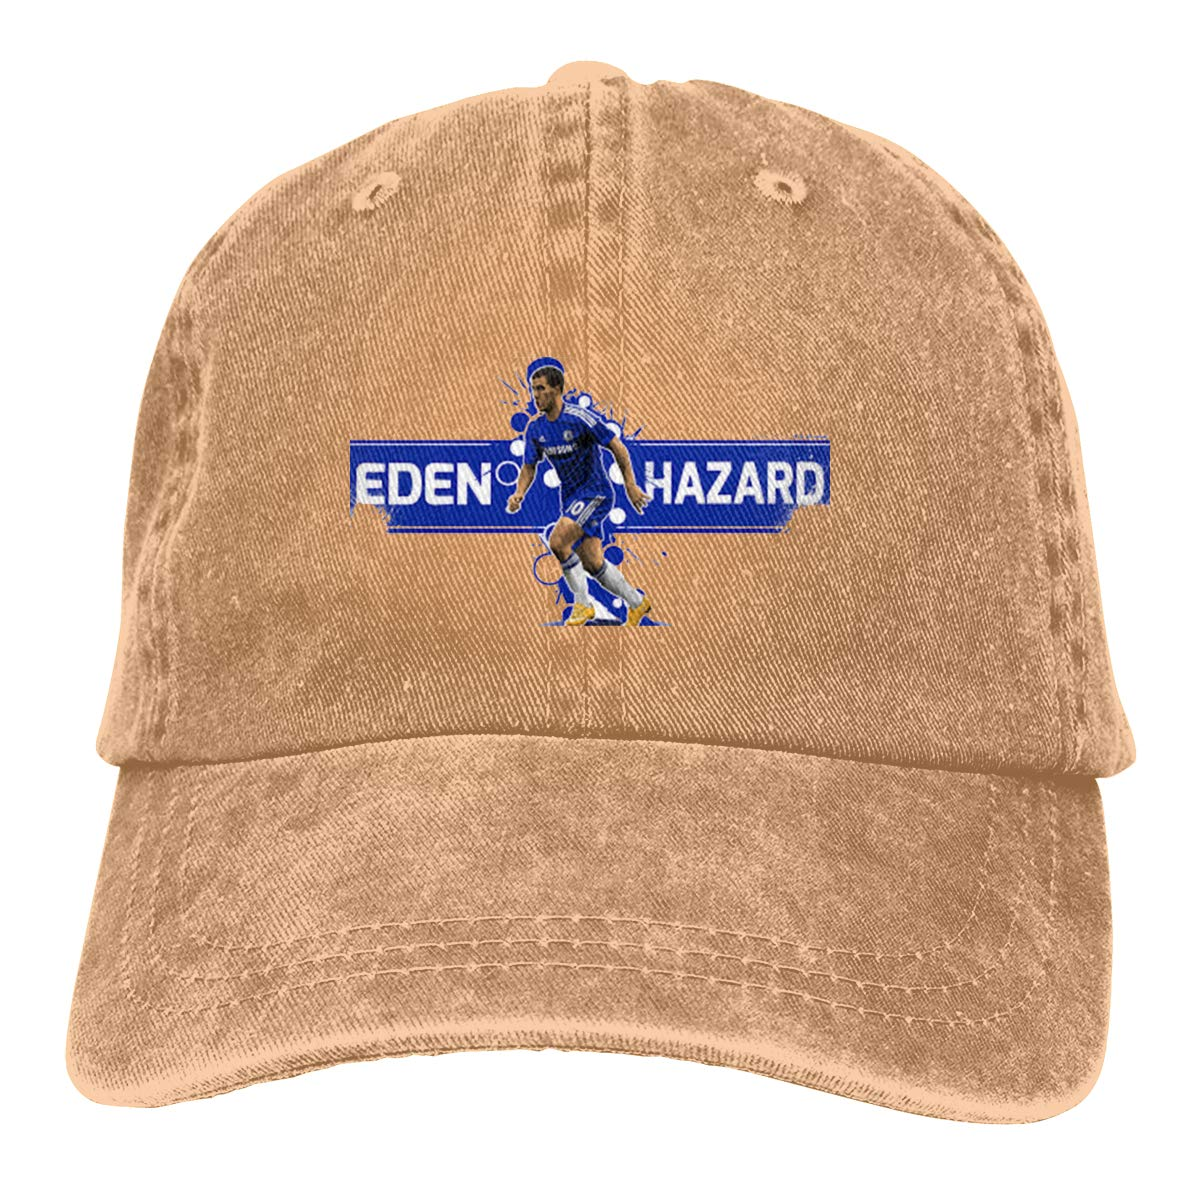 DeniCar Unisex Adjustable Baseball Caps Soccer-Eden-Hazard-Star Cowboy Skull Cap